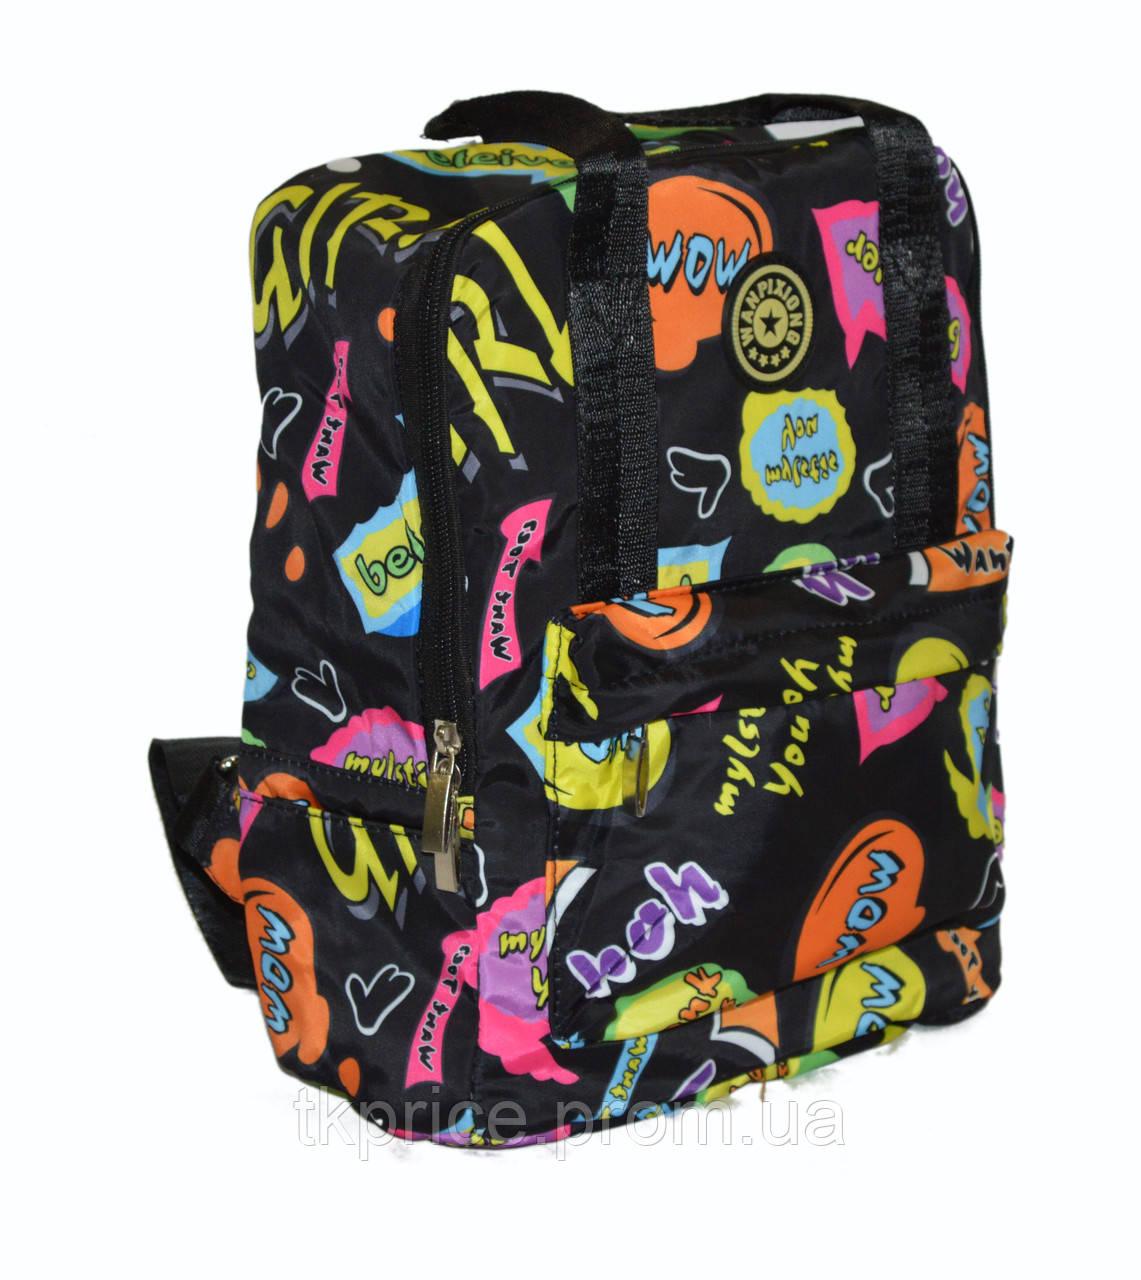 Прогулочная сумка-рюкзак черная